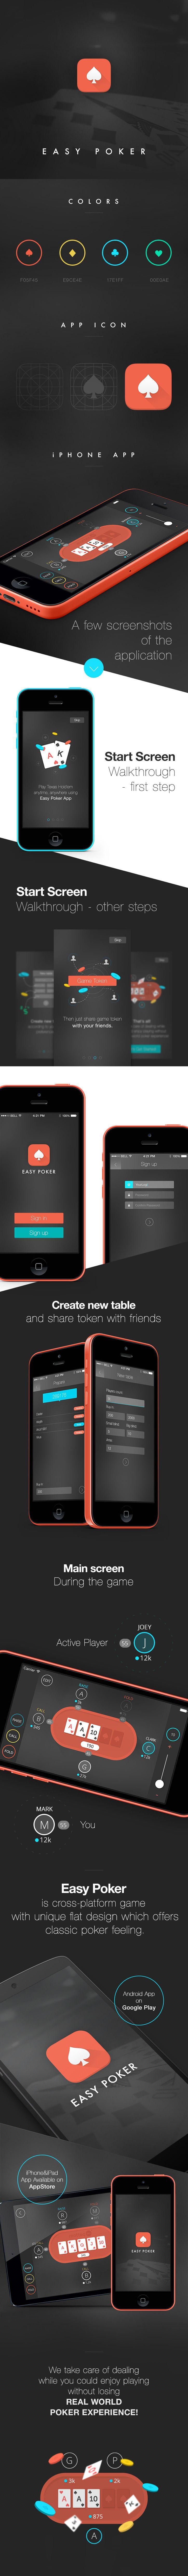 Easy Poker |Design Resources